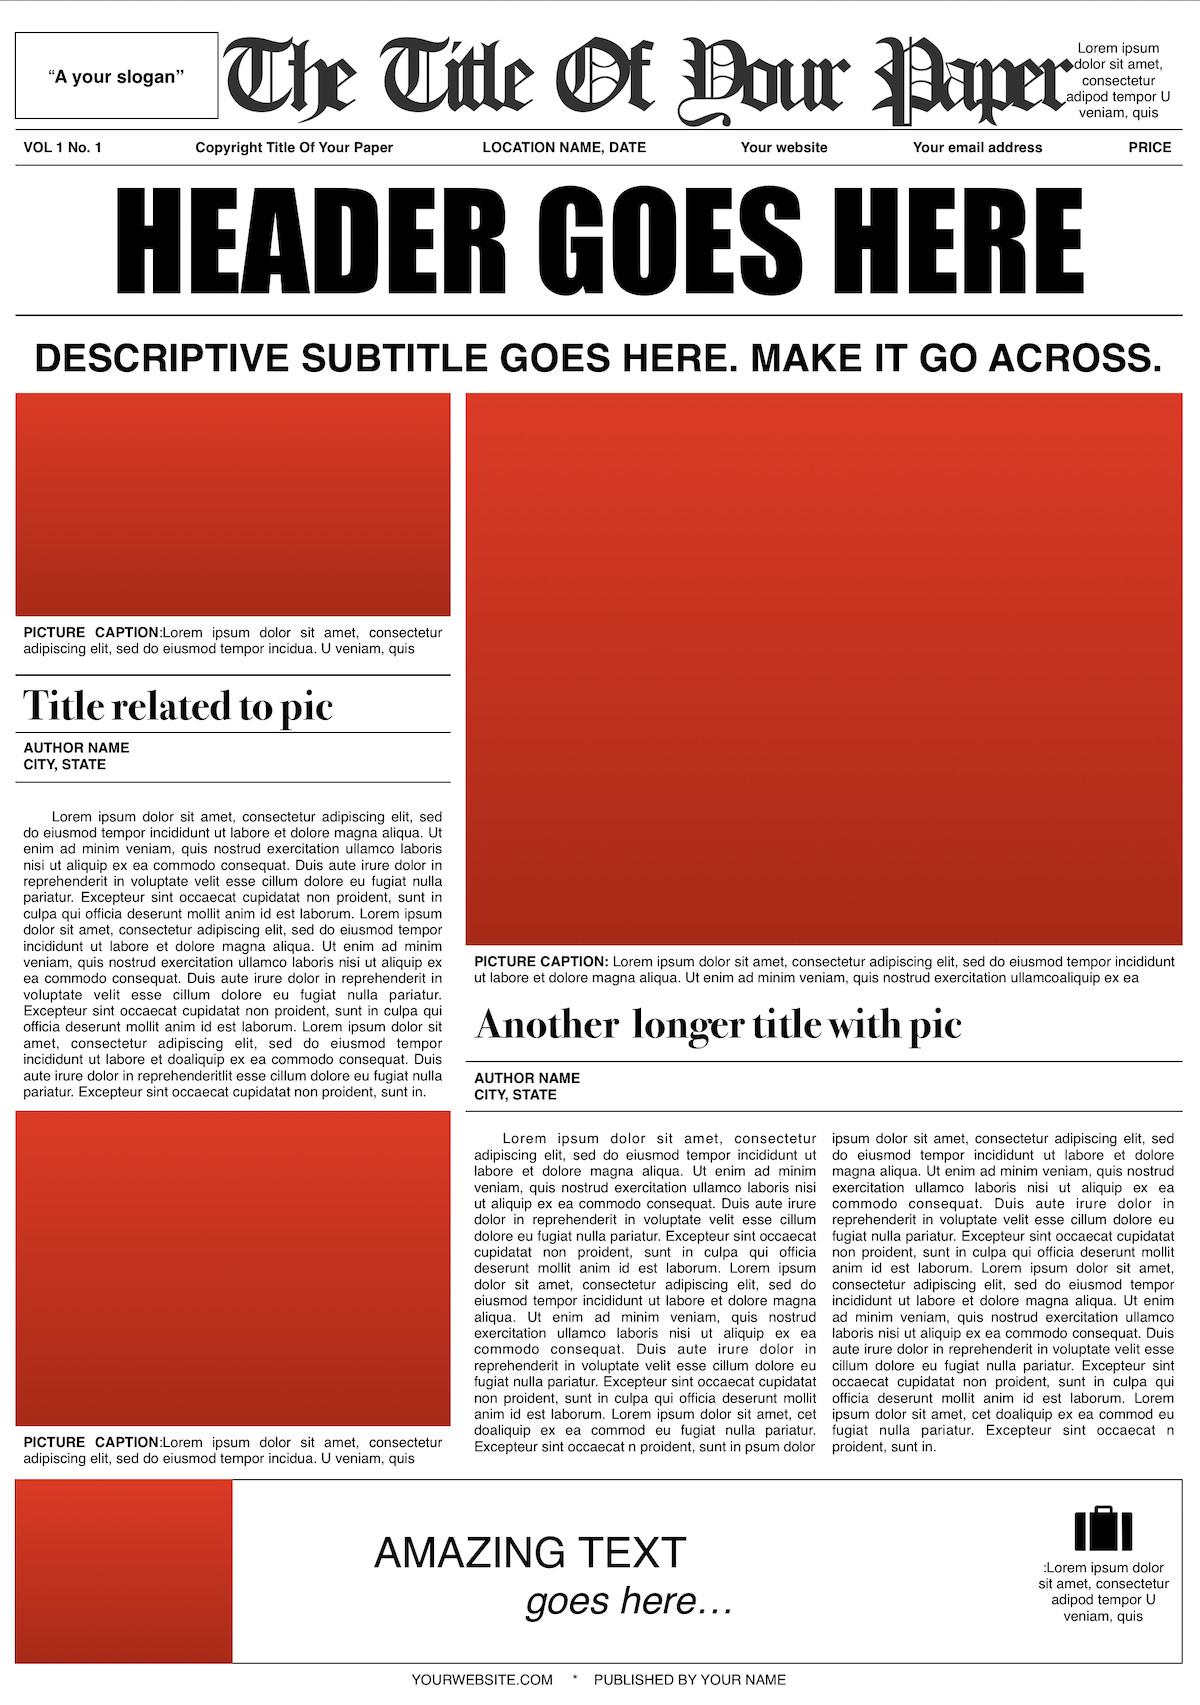 New York Times Newspaper Template Google Docs Newspaper Template Design Mockup